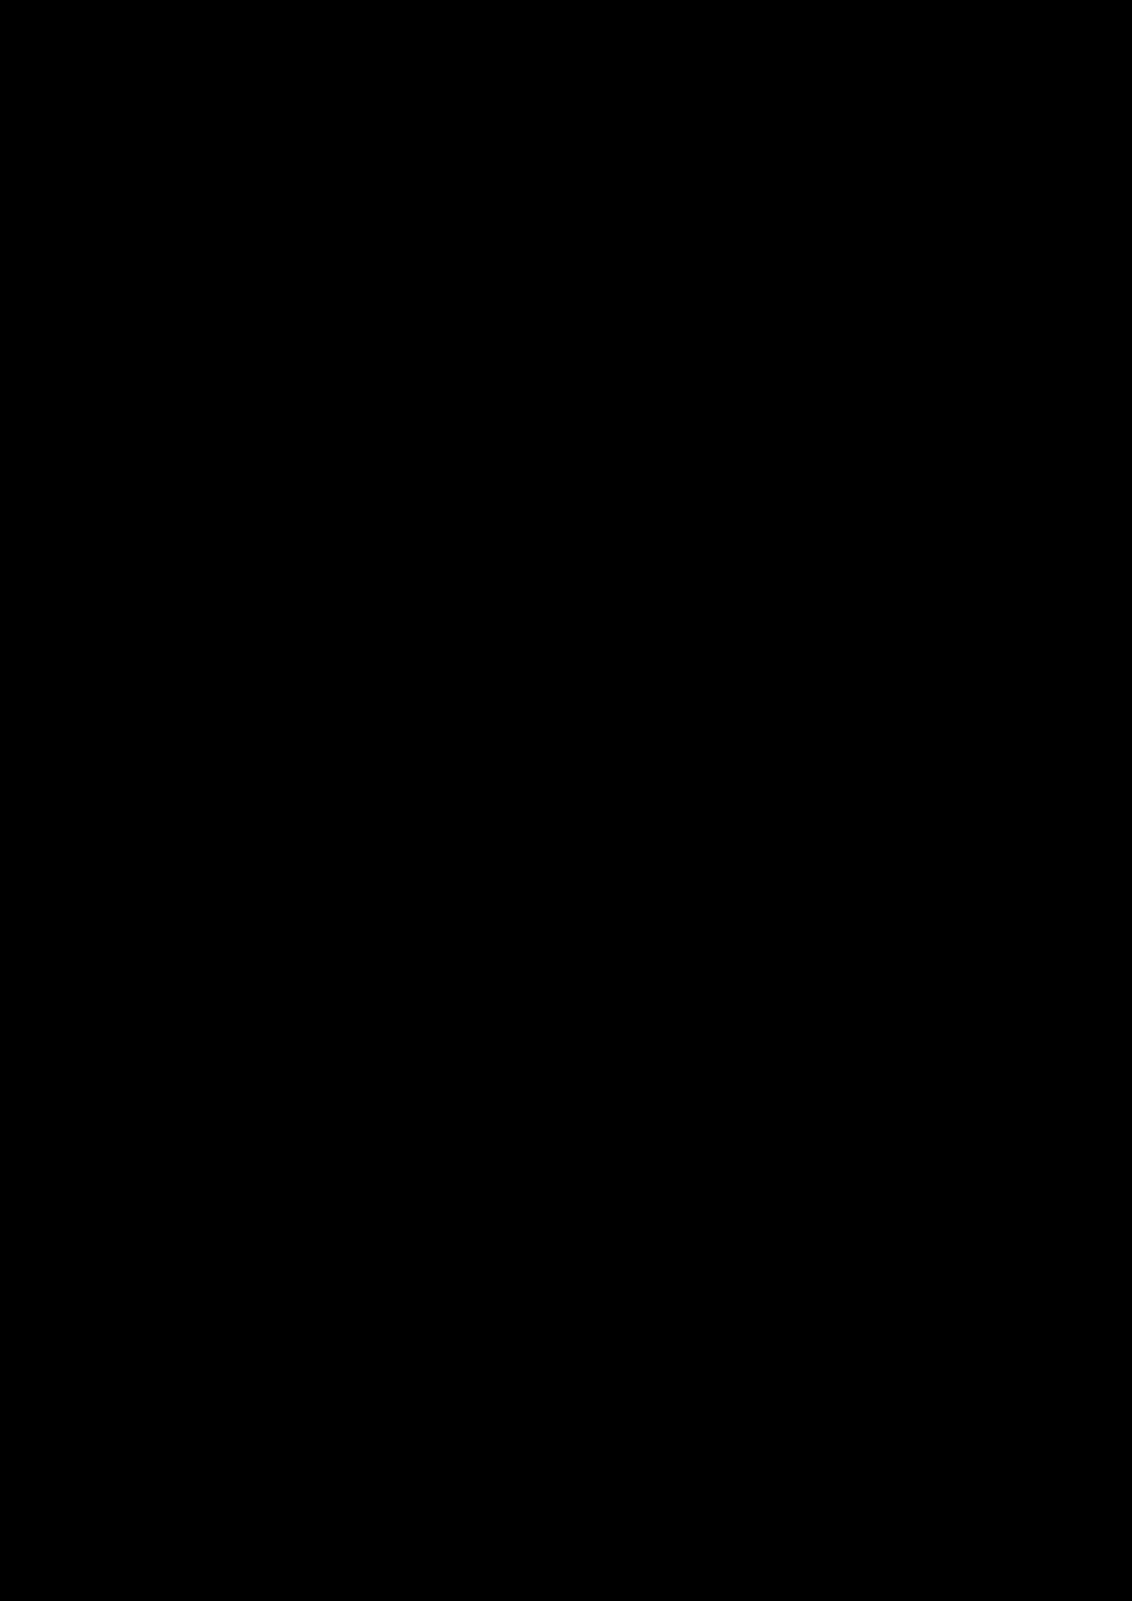 Fantom slide, Image 1